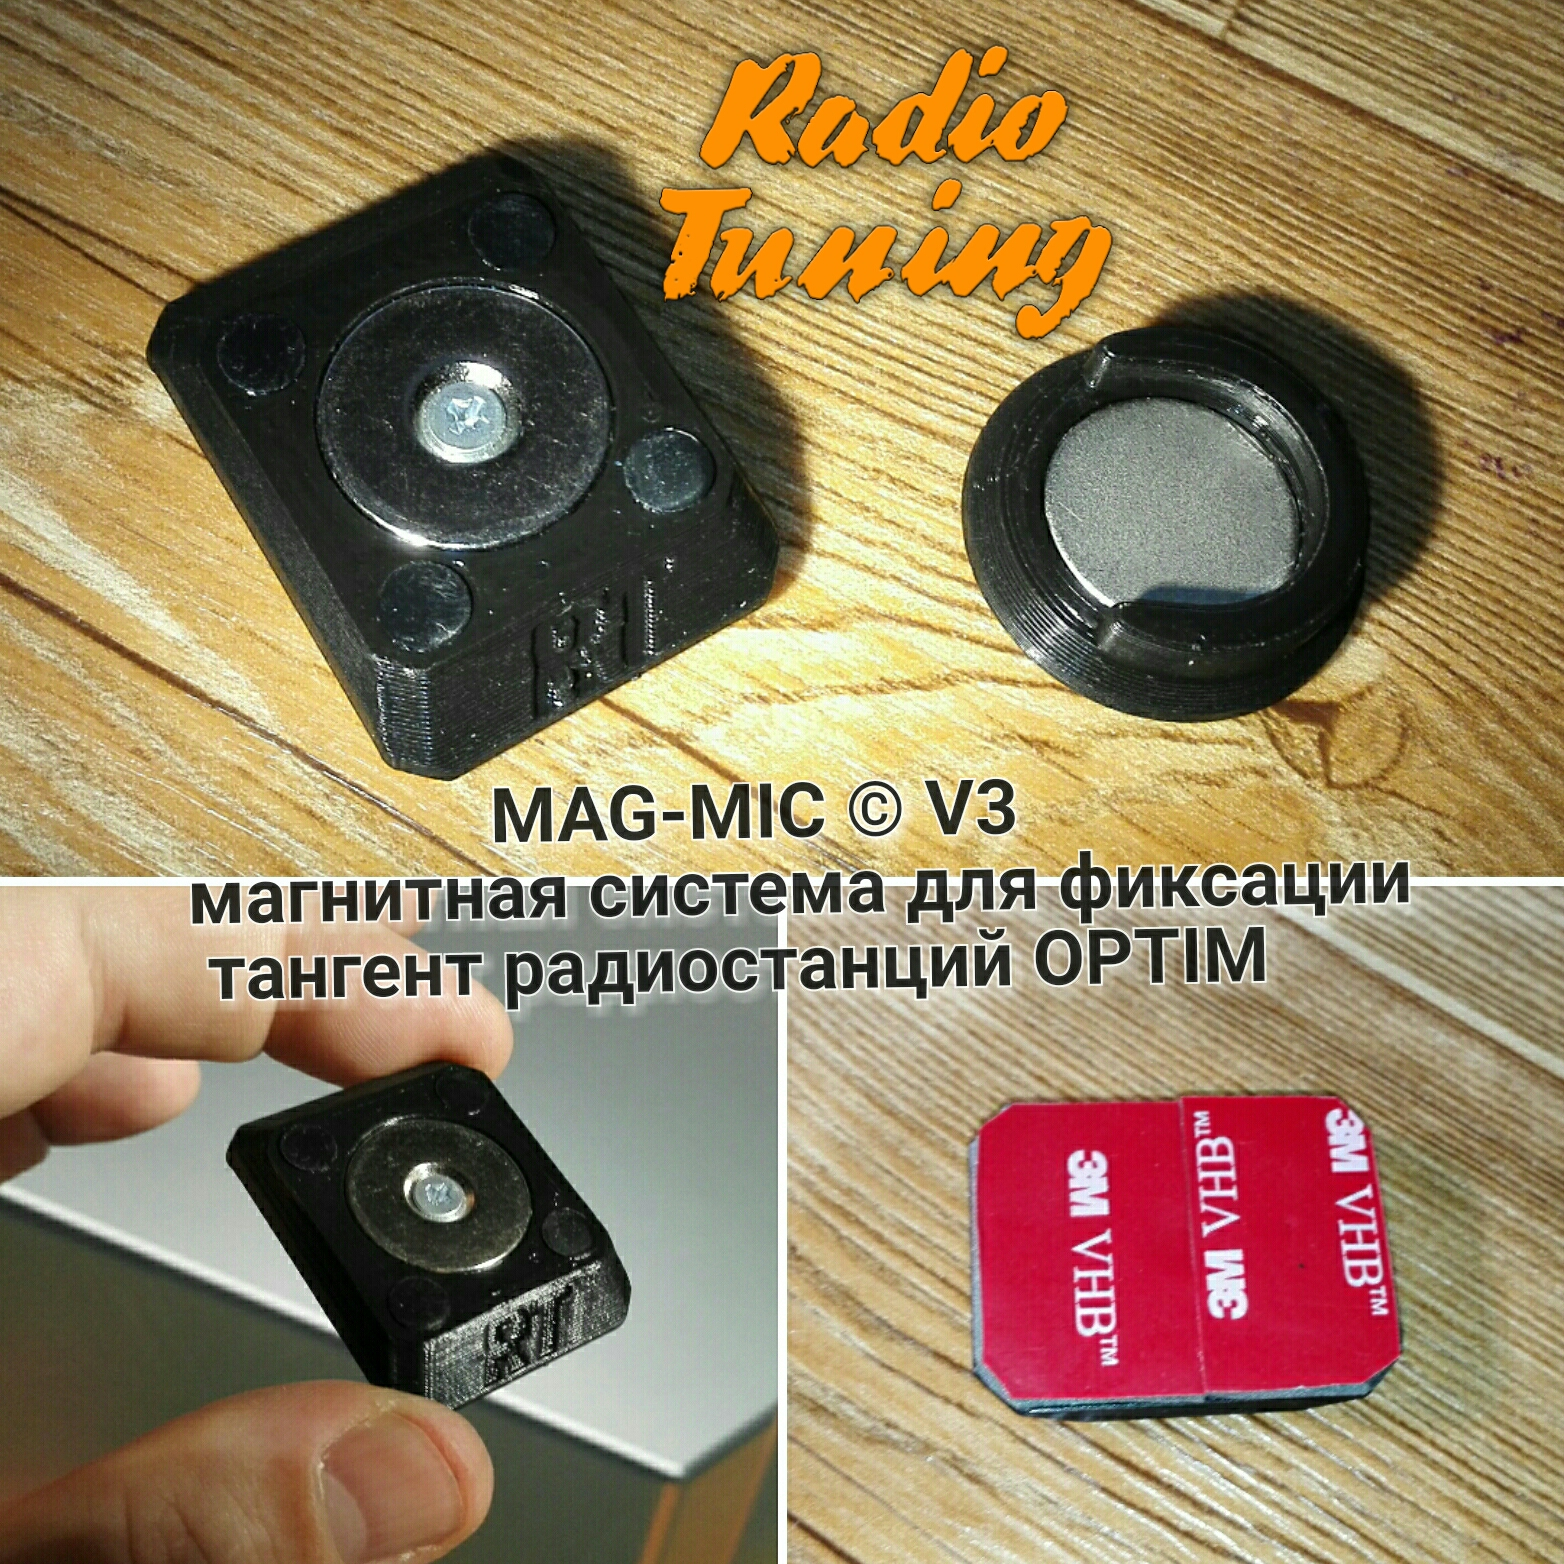 mag-mic